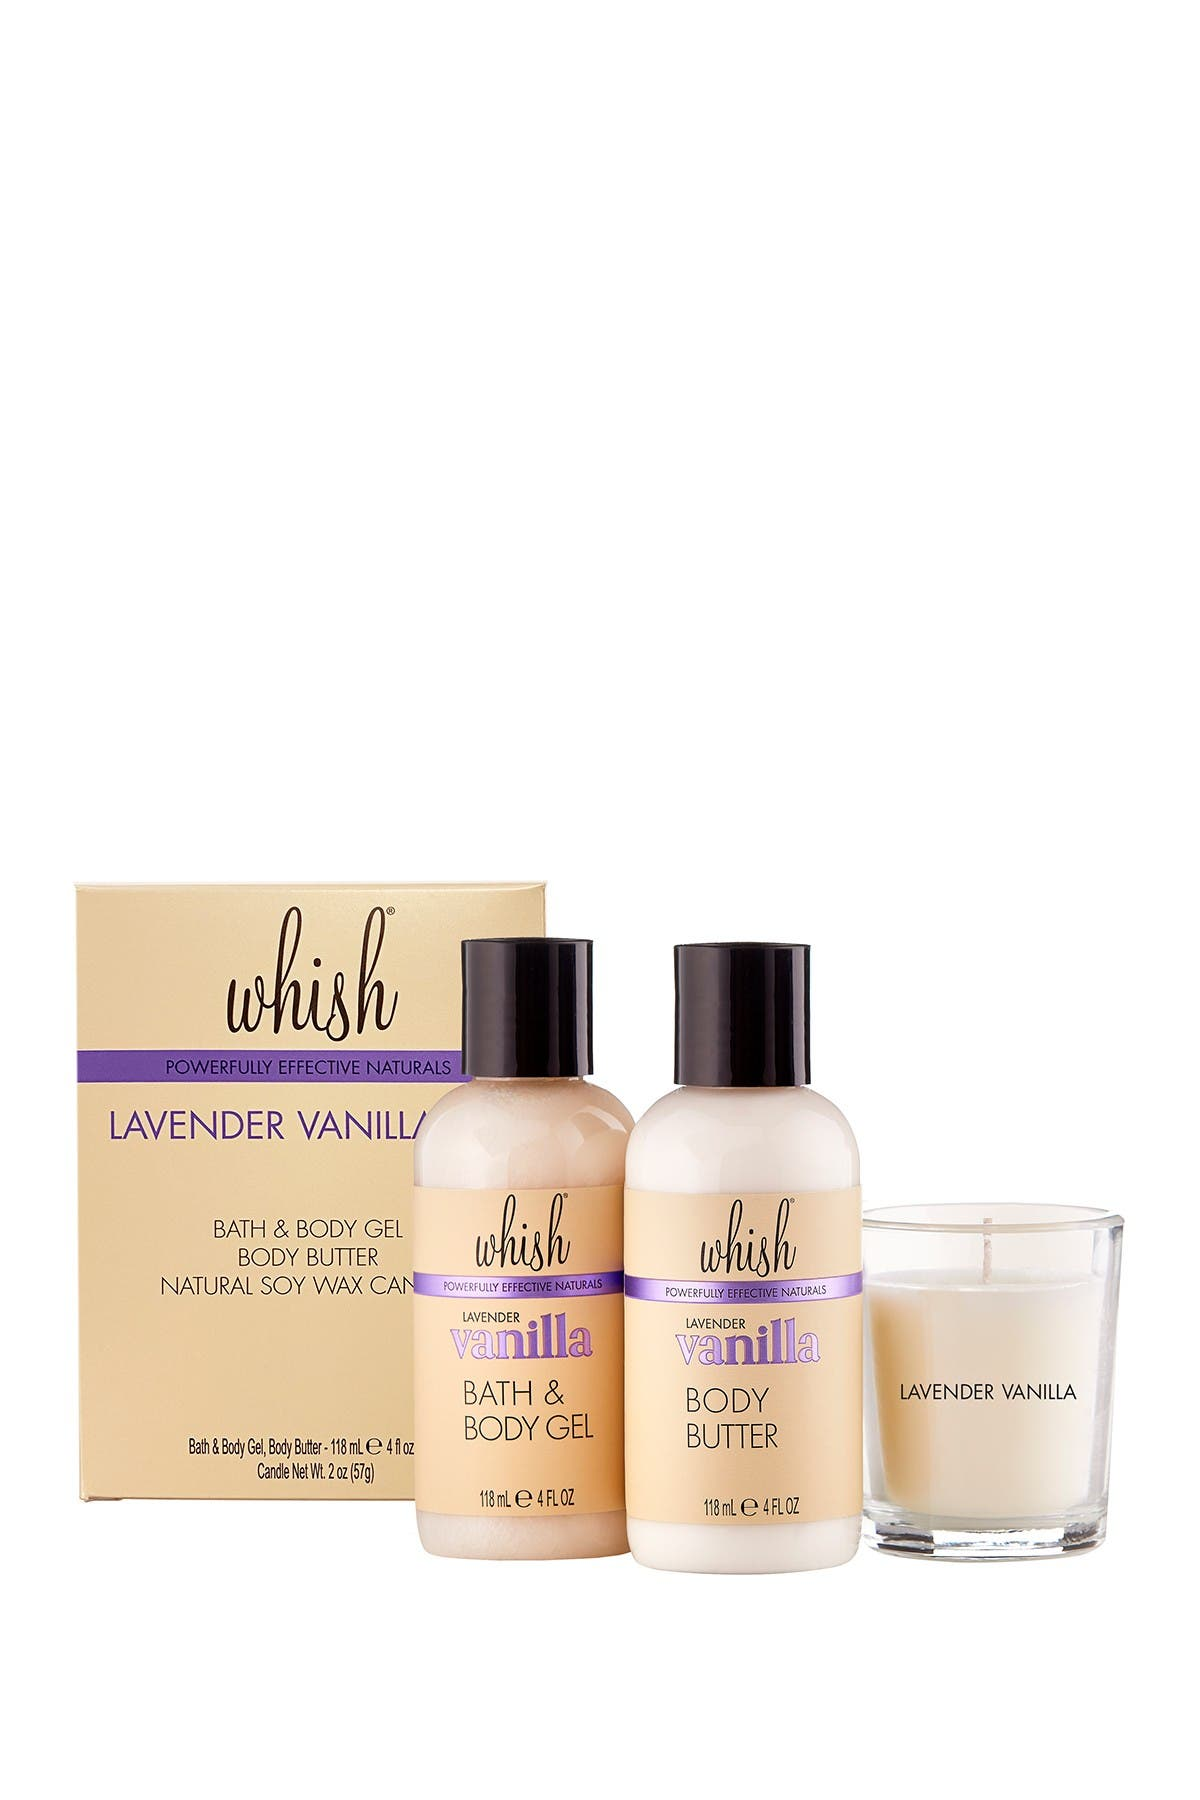 Image of Whish Lavender Vanilla Set - Includes 4oz Bath & Body Gel, 4oz Body Butter & 2oz Votive Candle